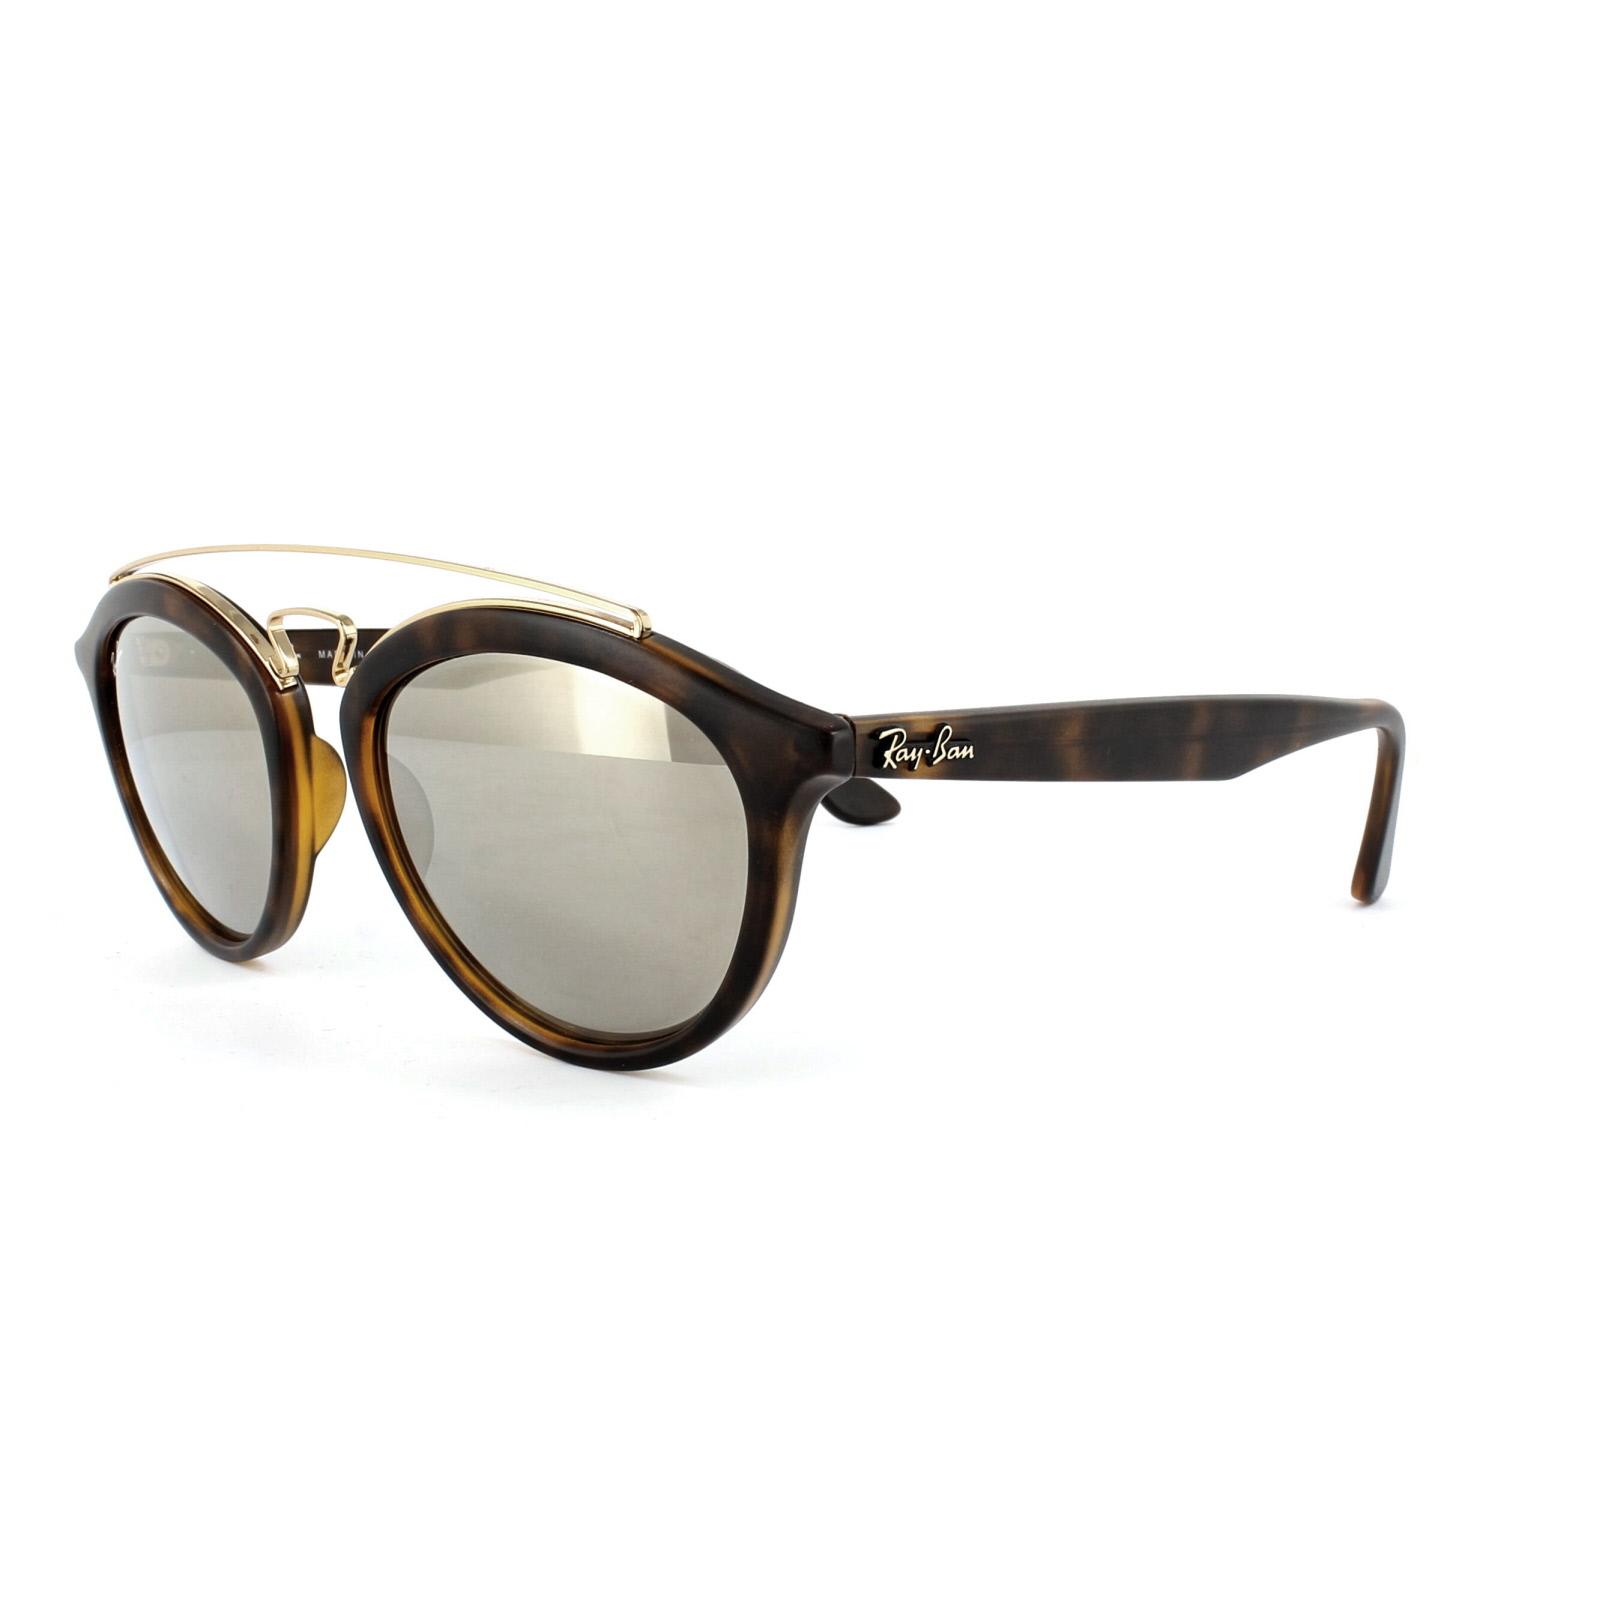 d5ec820f301 Sentinel Ray-Ban Sunglasses New Gatsby 4257 60925A Matt Havana Brown Gold  Mirror 50mm